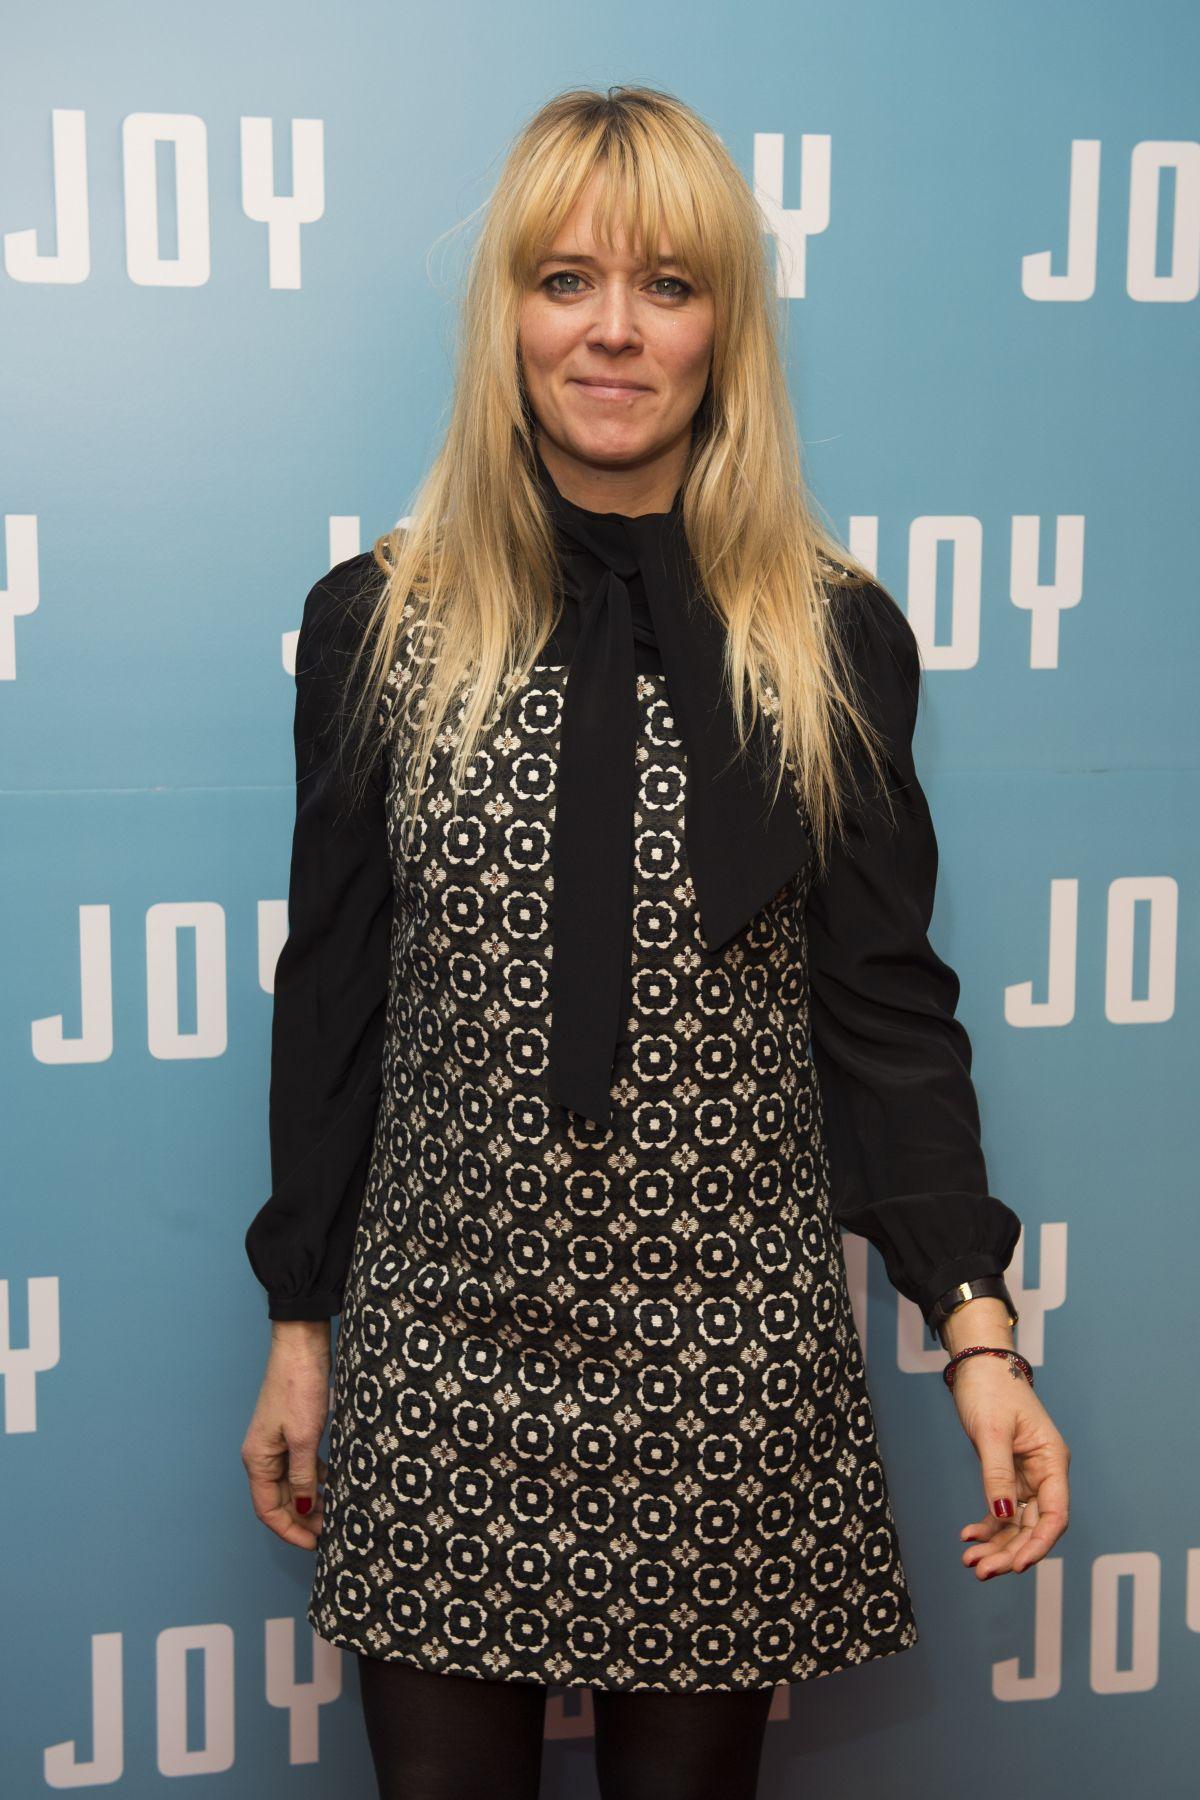 EDITH BOWMAN at Joy Special Screening at The Ham Yard Hotel in London 12/17/2015